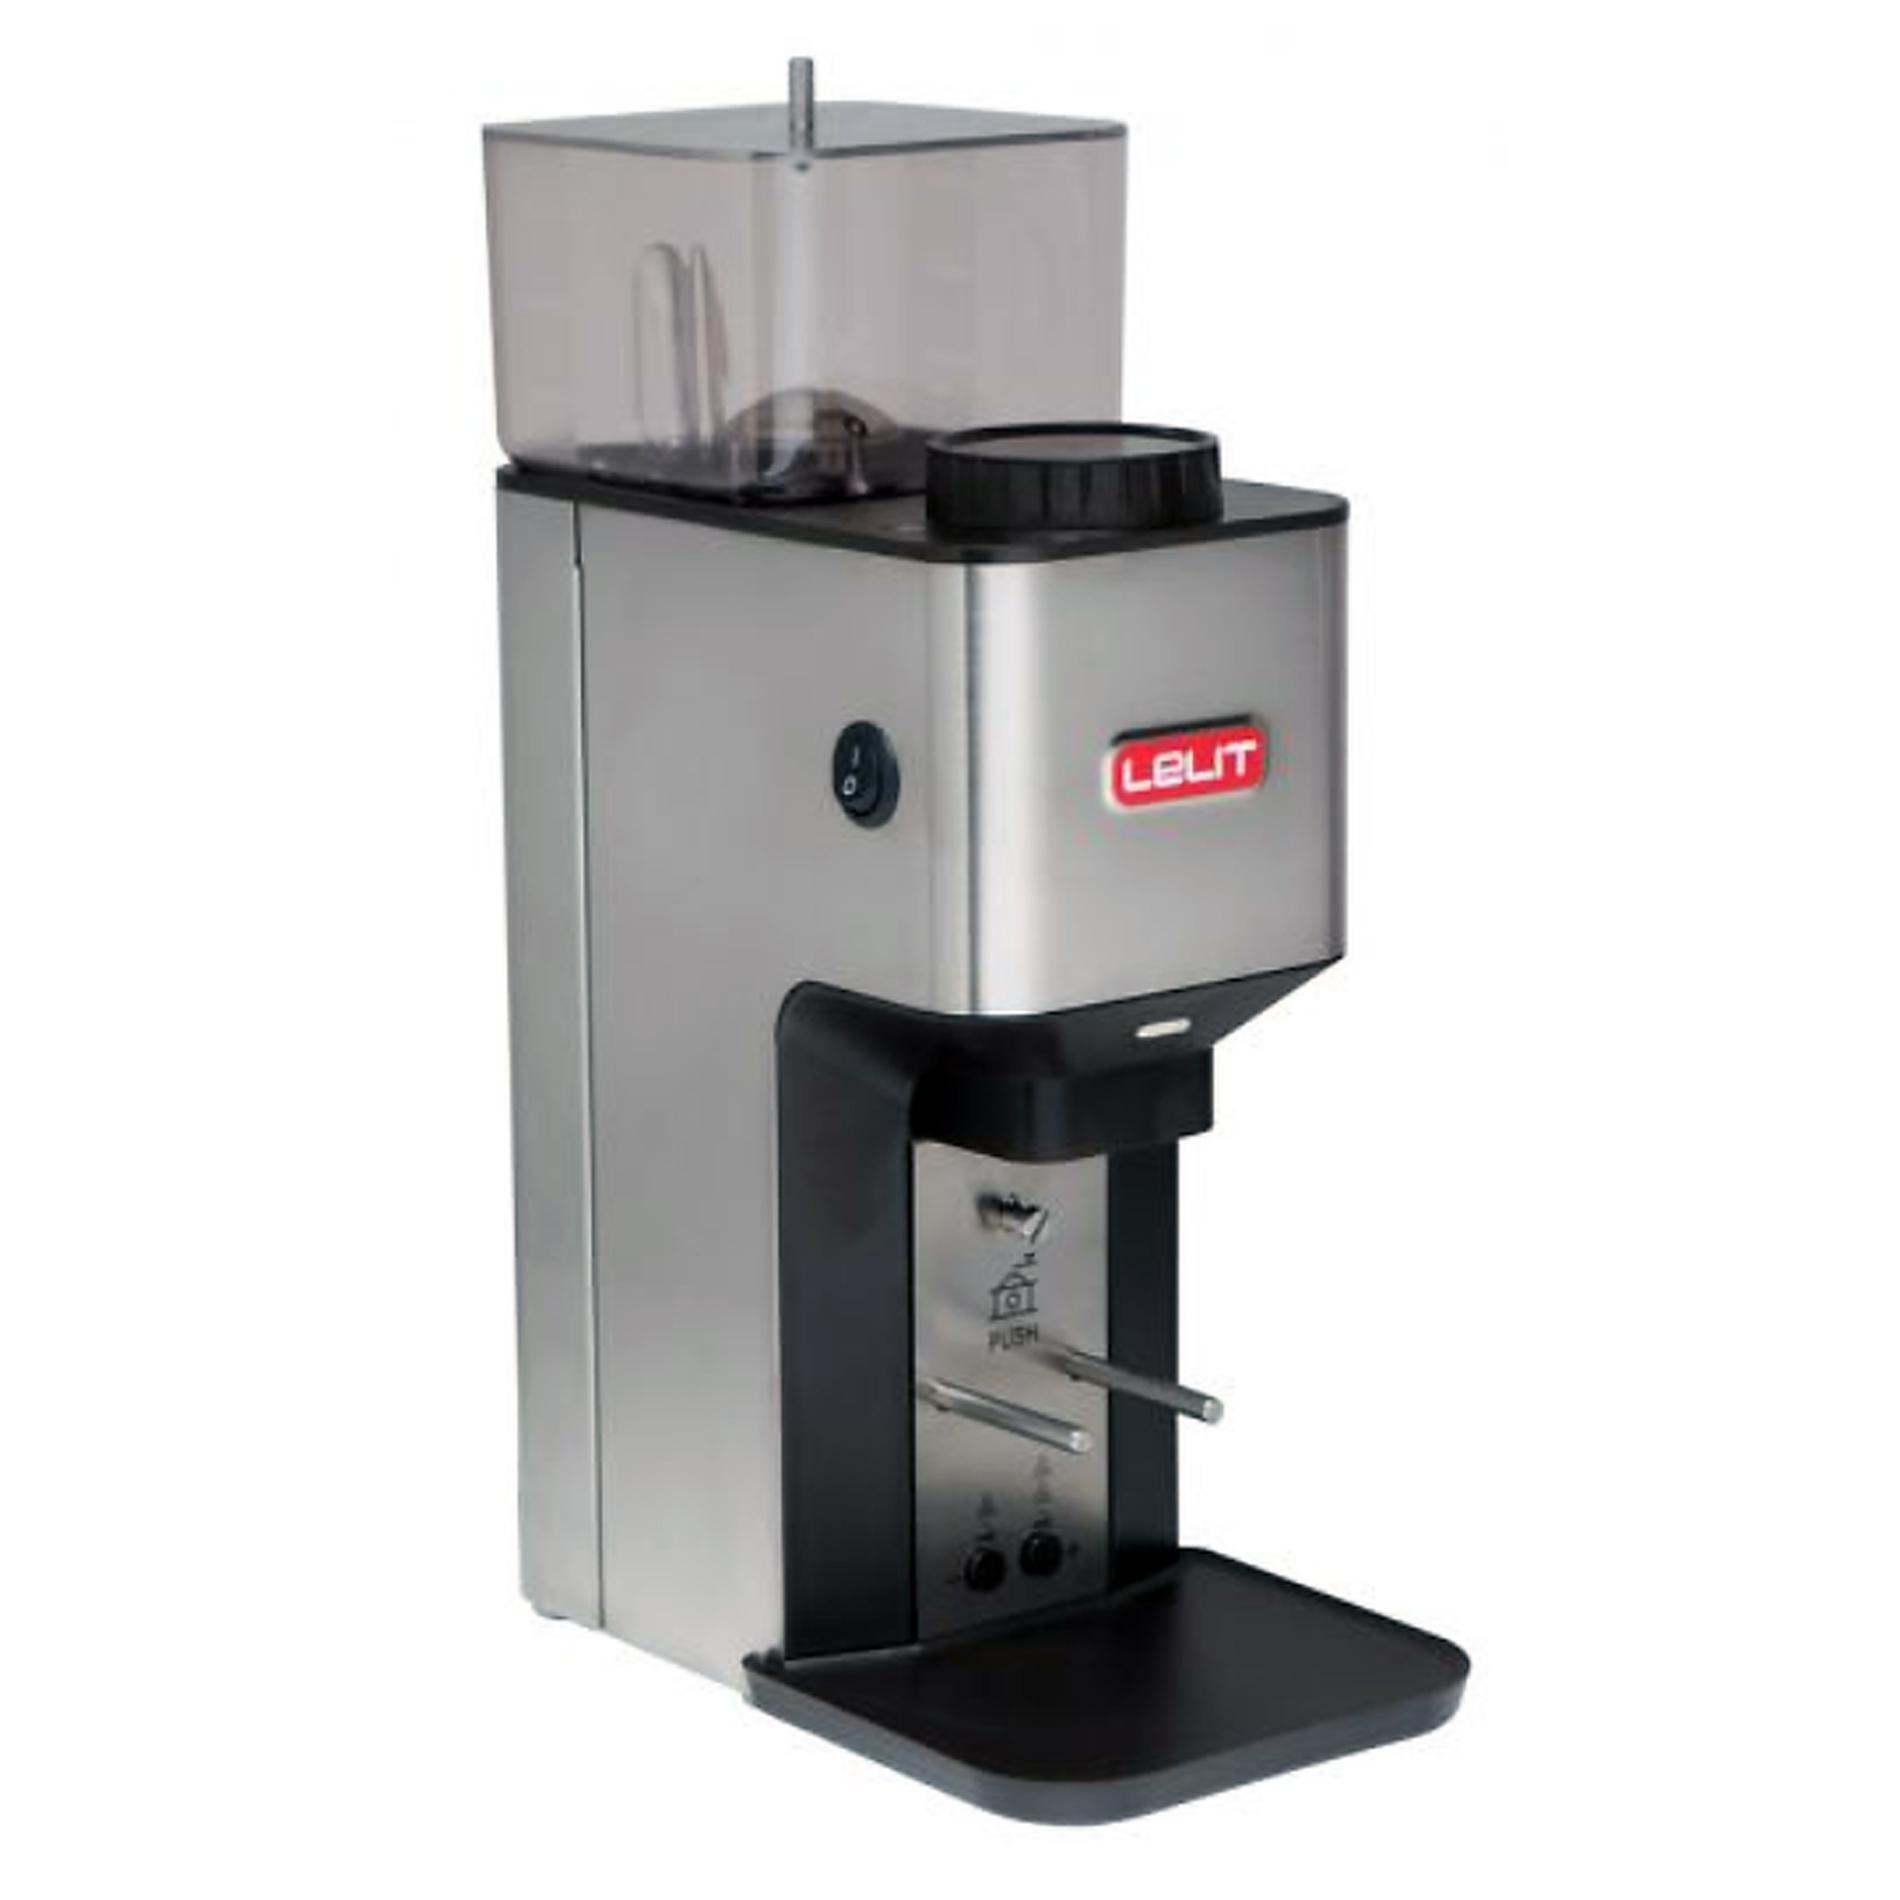 Lelit PL71 elektrische Kaffeemühle